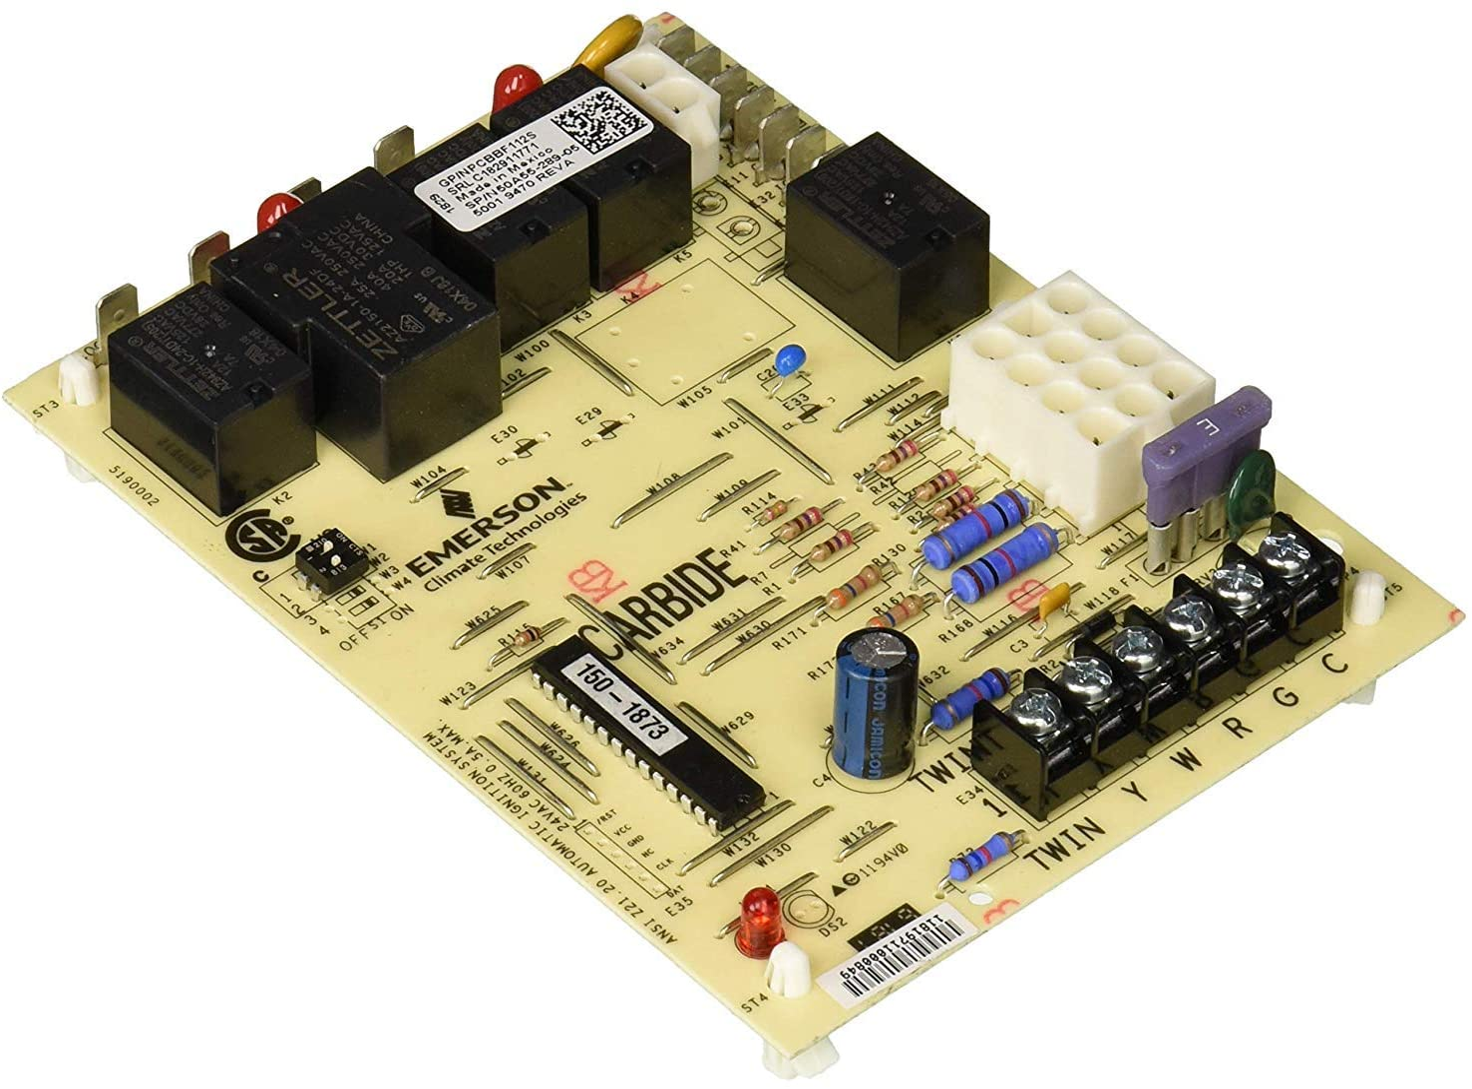 Goodman PCBBF112S Control Board